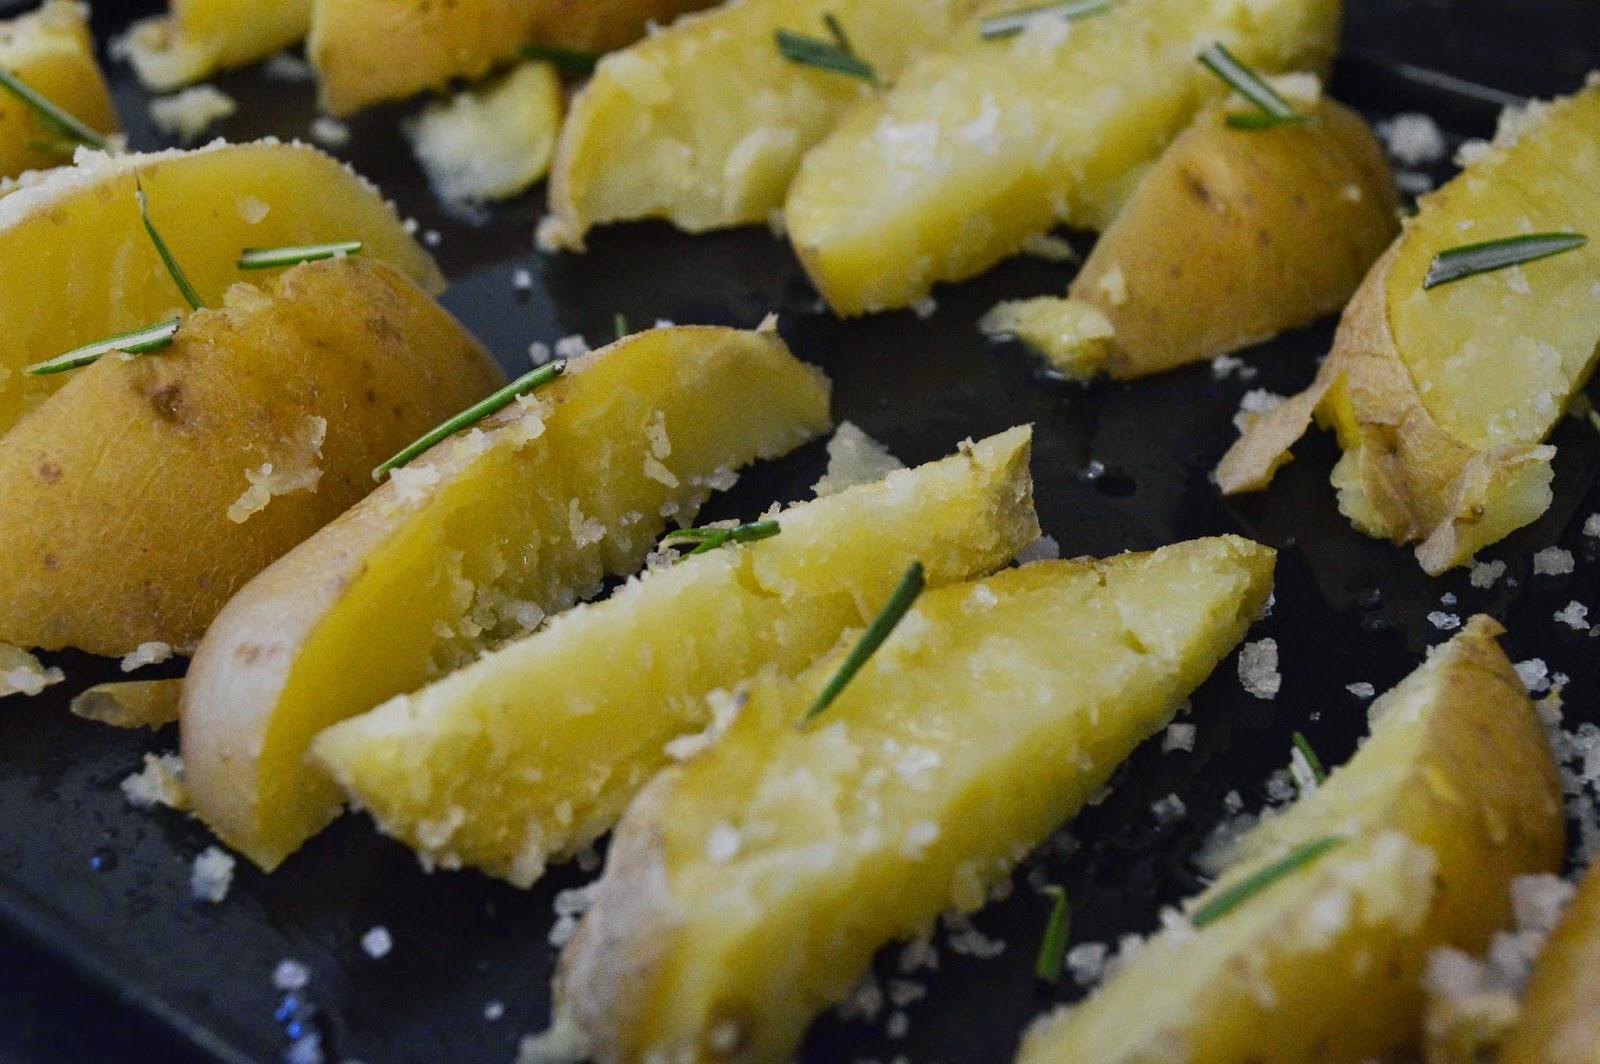 Fresh potato cut into wedges